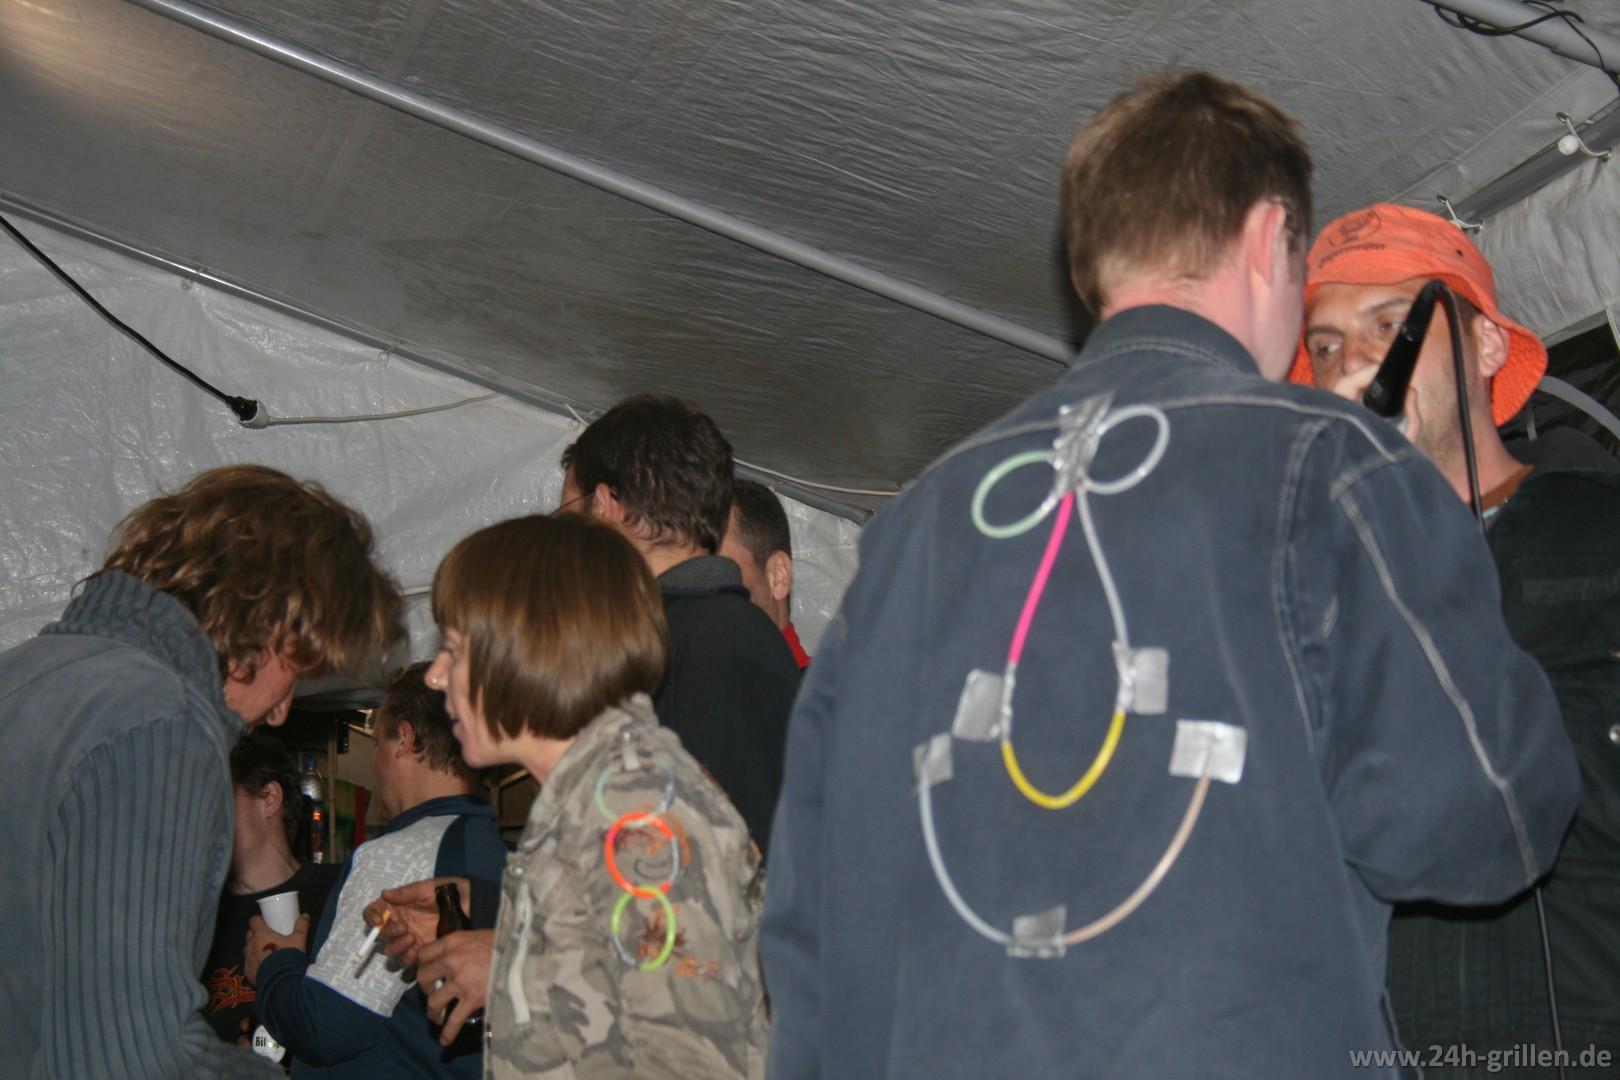 IMG_2008 (339)